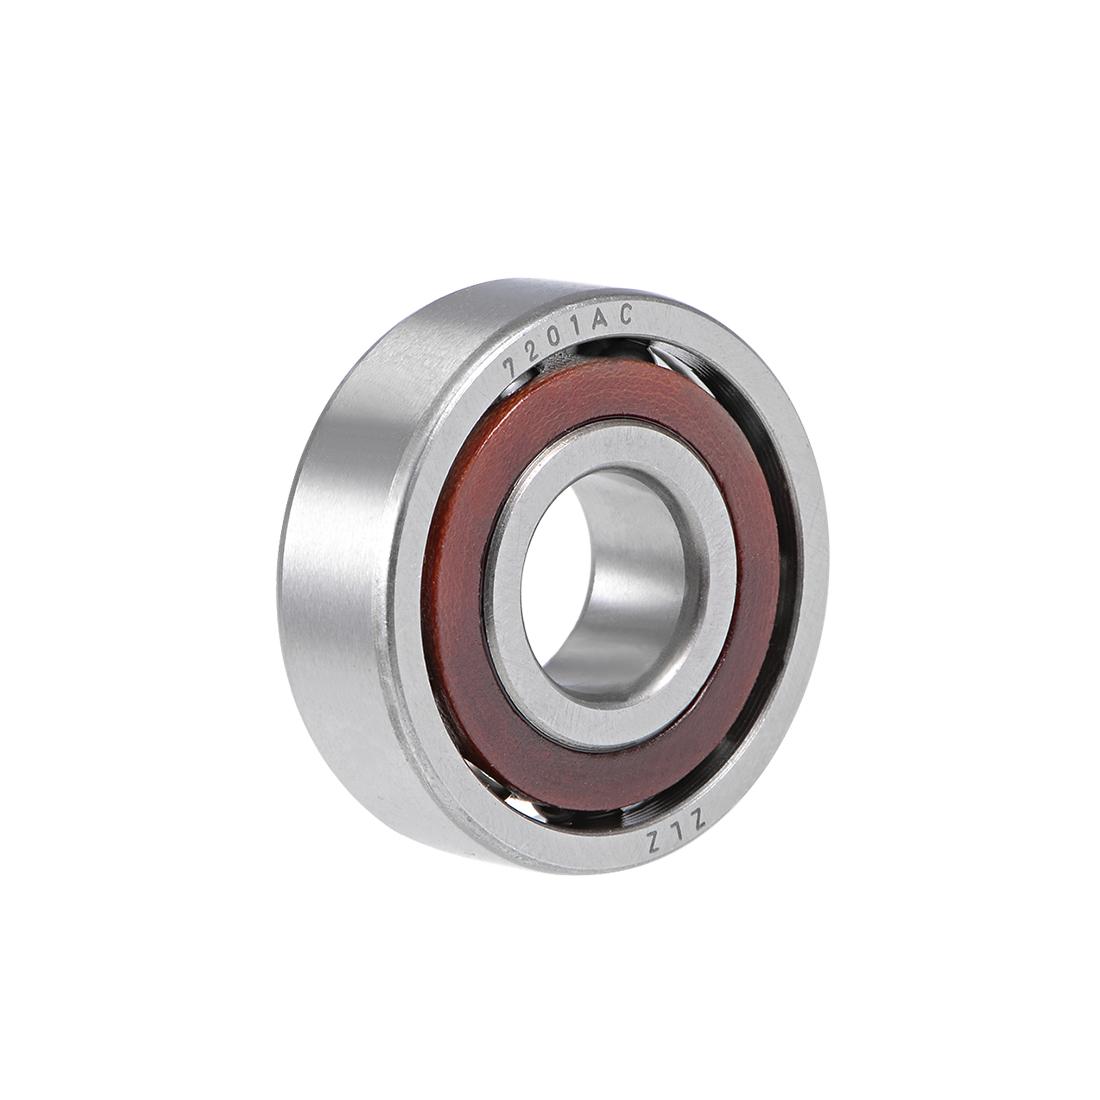 7201AC Angular Contact Ball Bearing 12x32x10mm, Single Row, Open Type